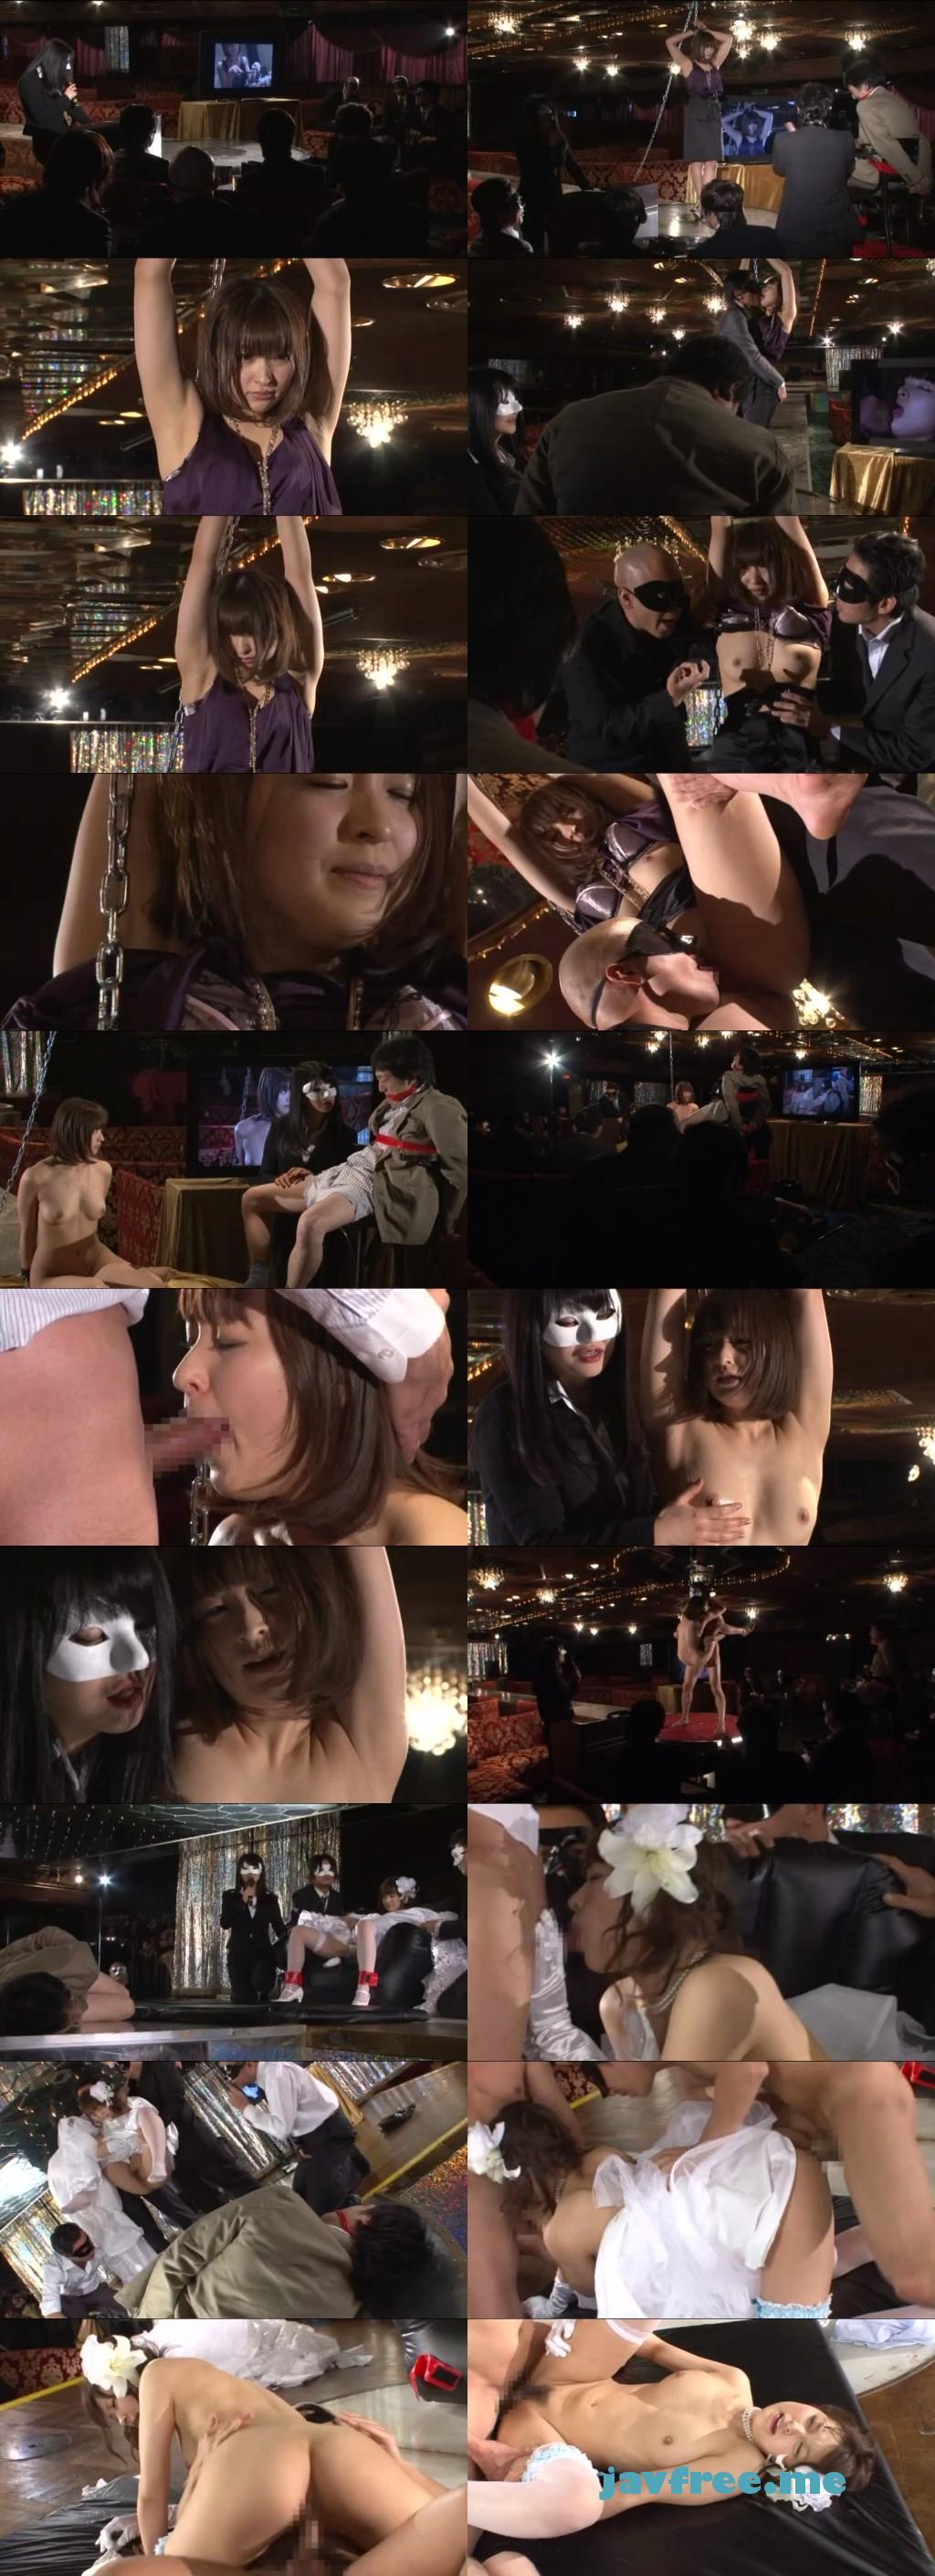 [SACE 064] 若妻陵辱オークション 周防ゆきこ 周防ゆきこ SACE